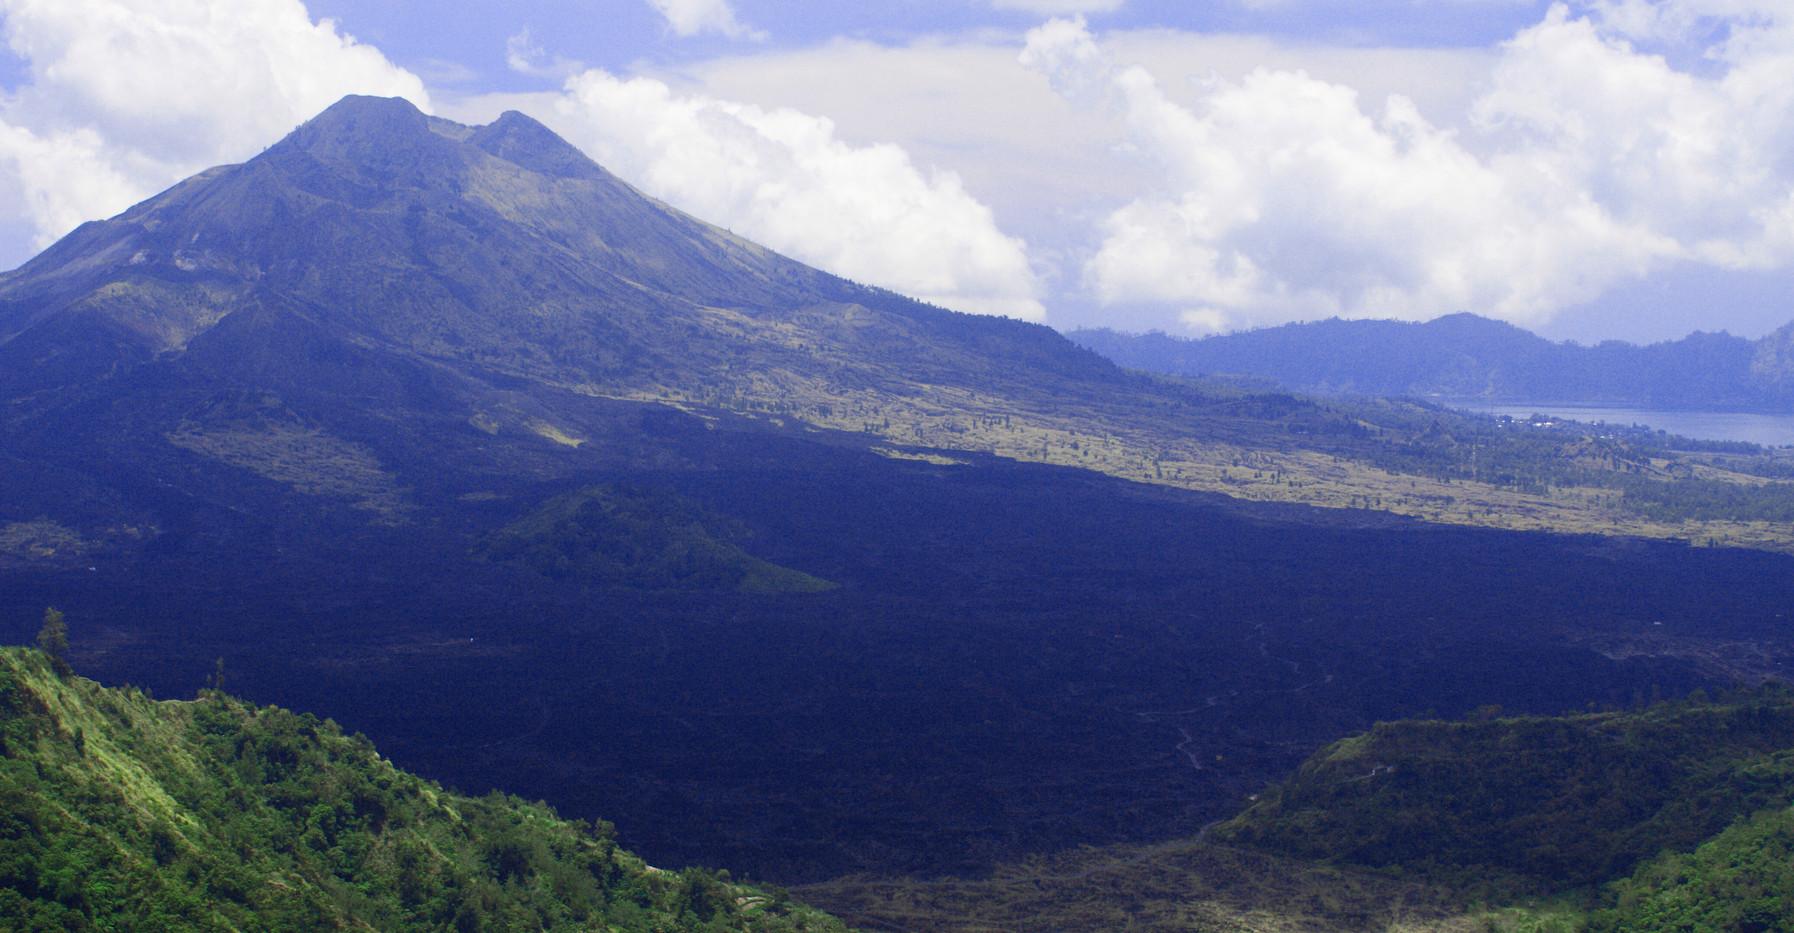 Gunung Agung Volcano